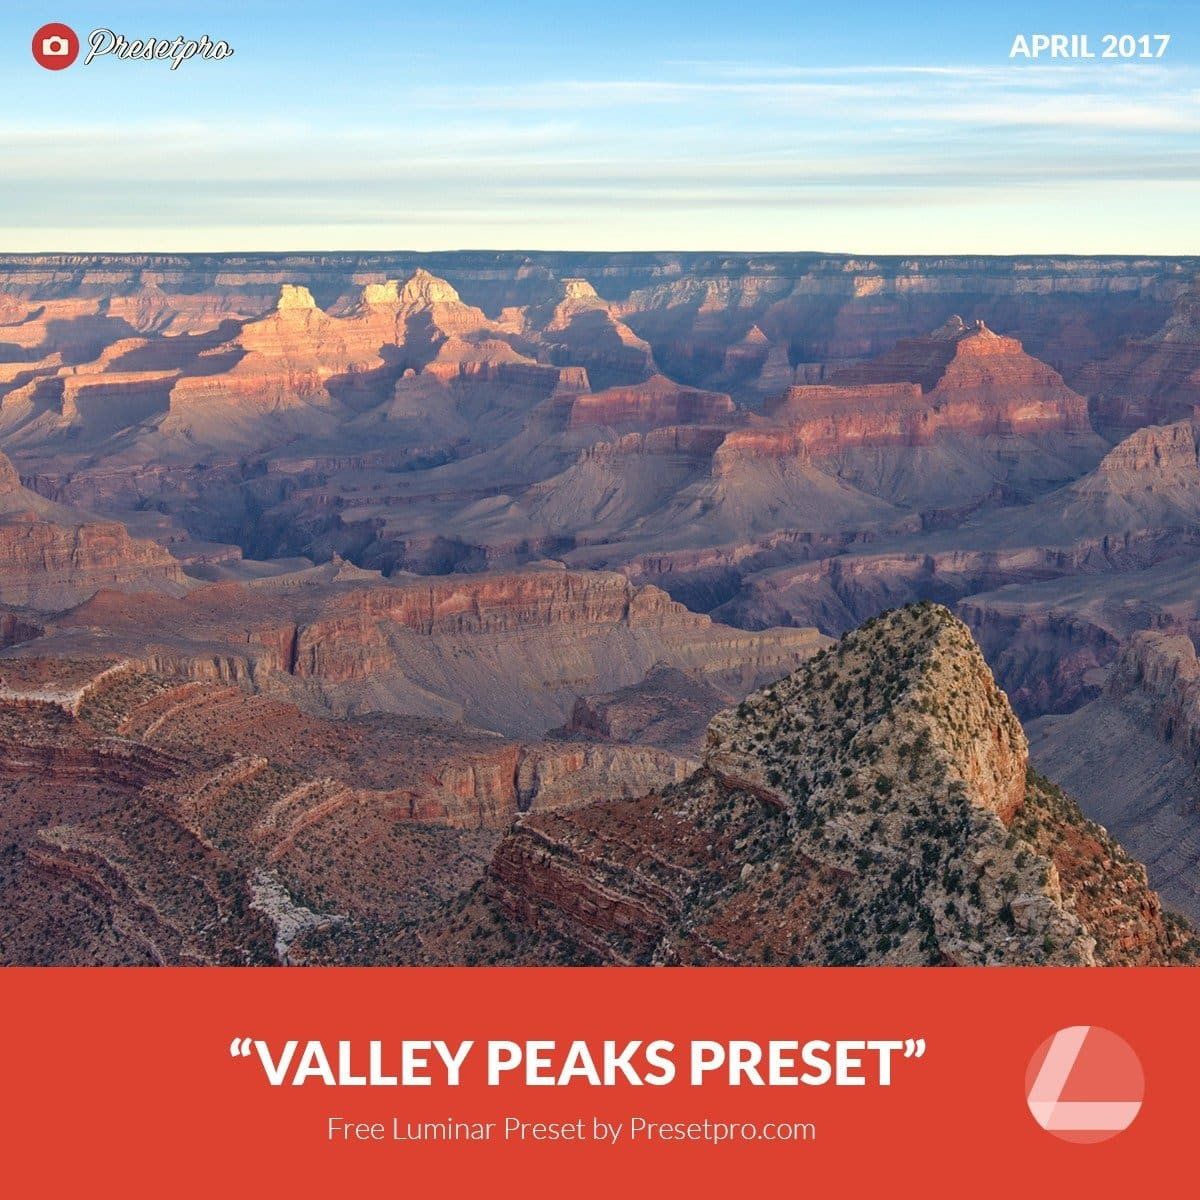 Free-Luminar-Presets-Valley-Peaks-Presetpro.com